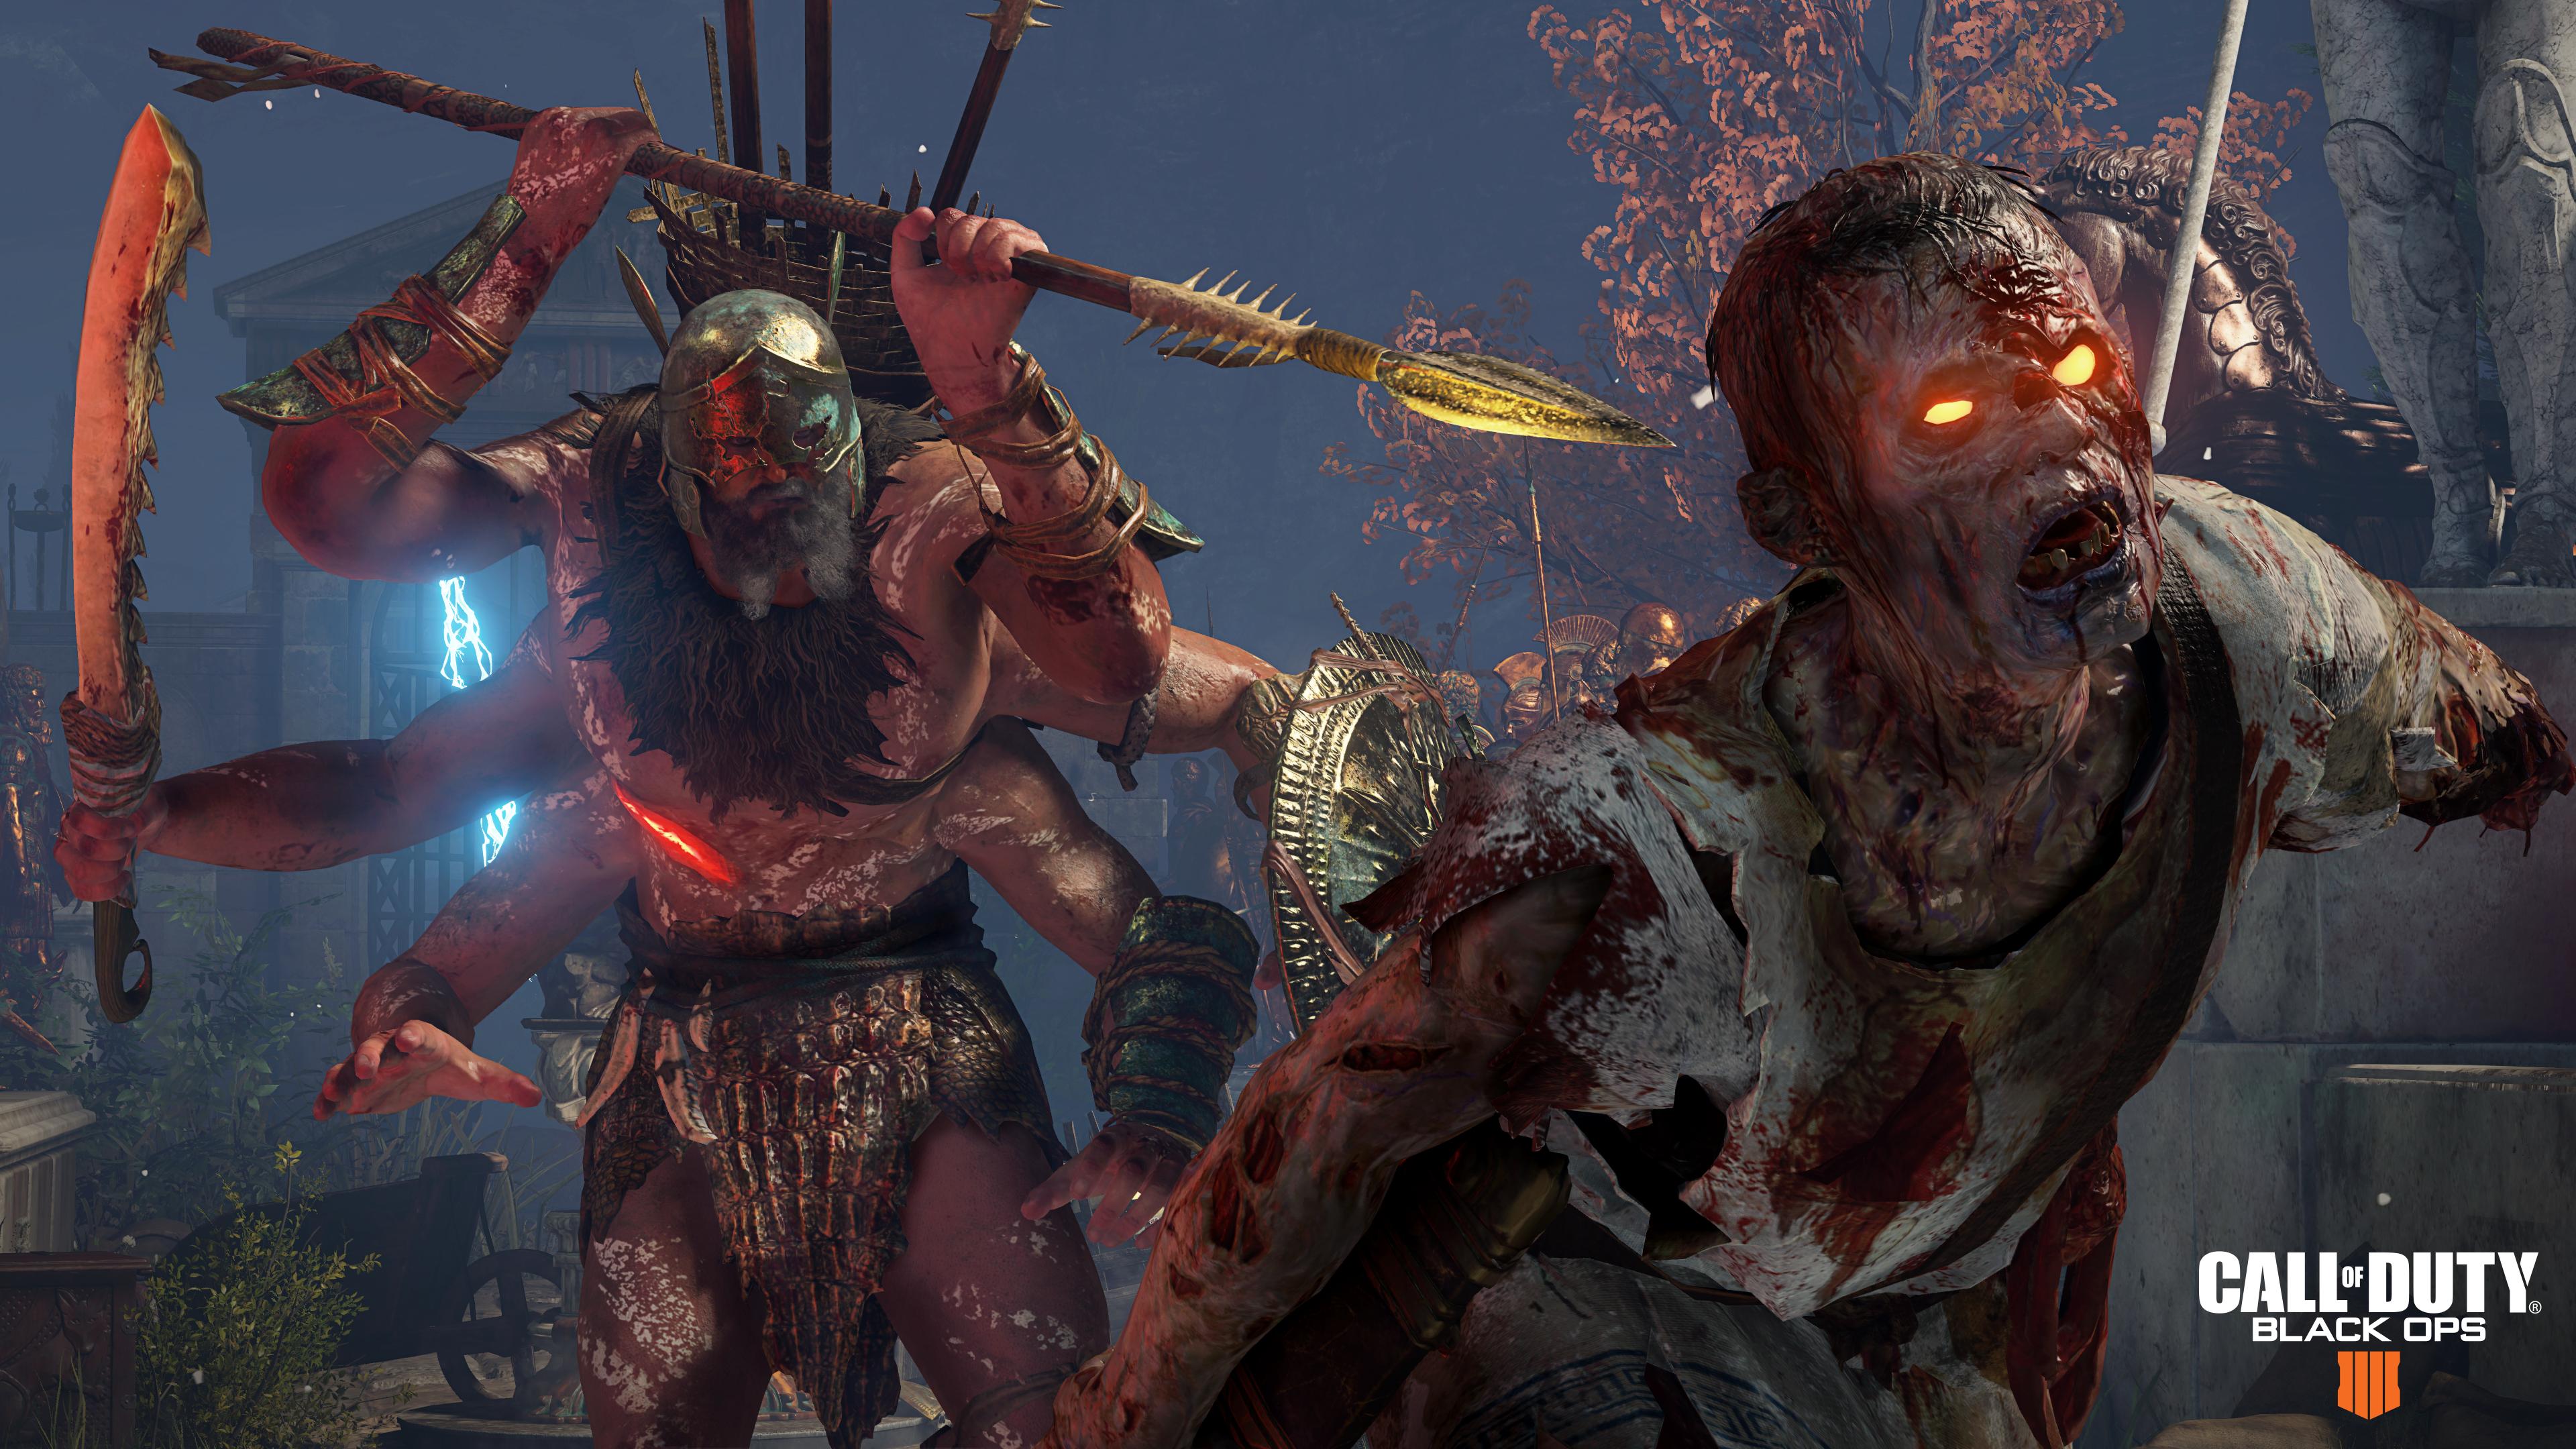 la-nueva-experiencia-del-modo-zombies-de-black-ops-4-ancient-evil-ya-esta-disponible-en-ps4-frikigamers.com.jpg